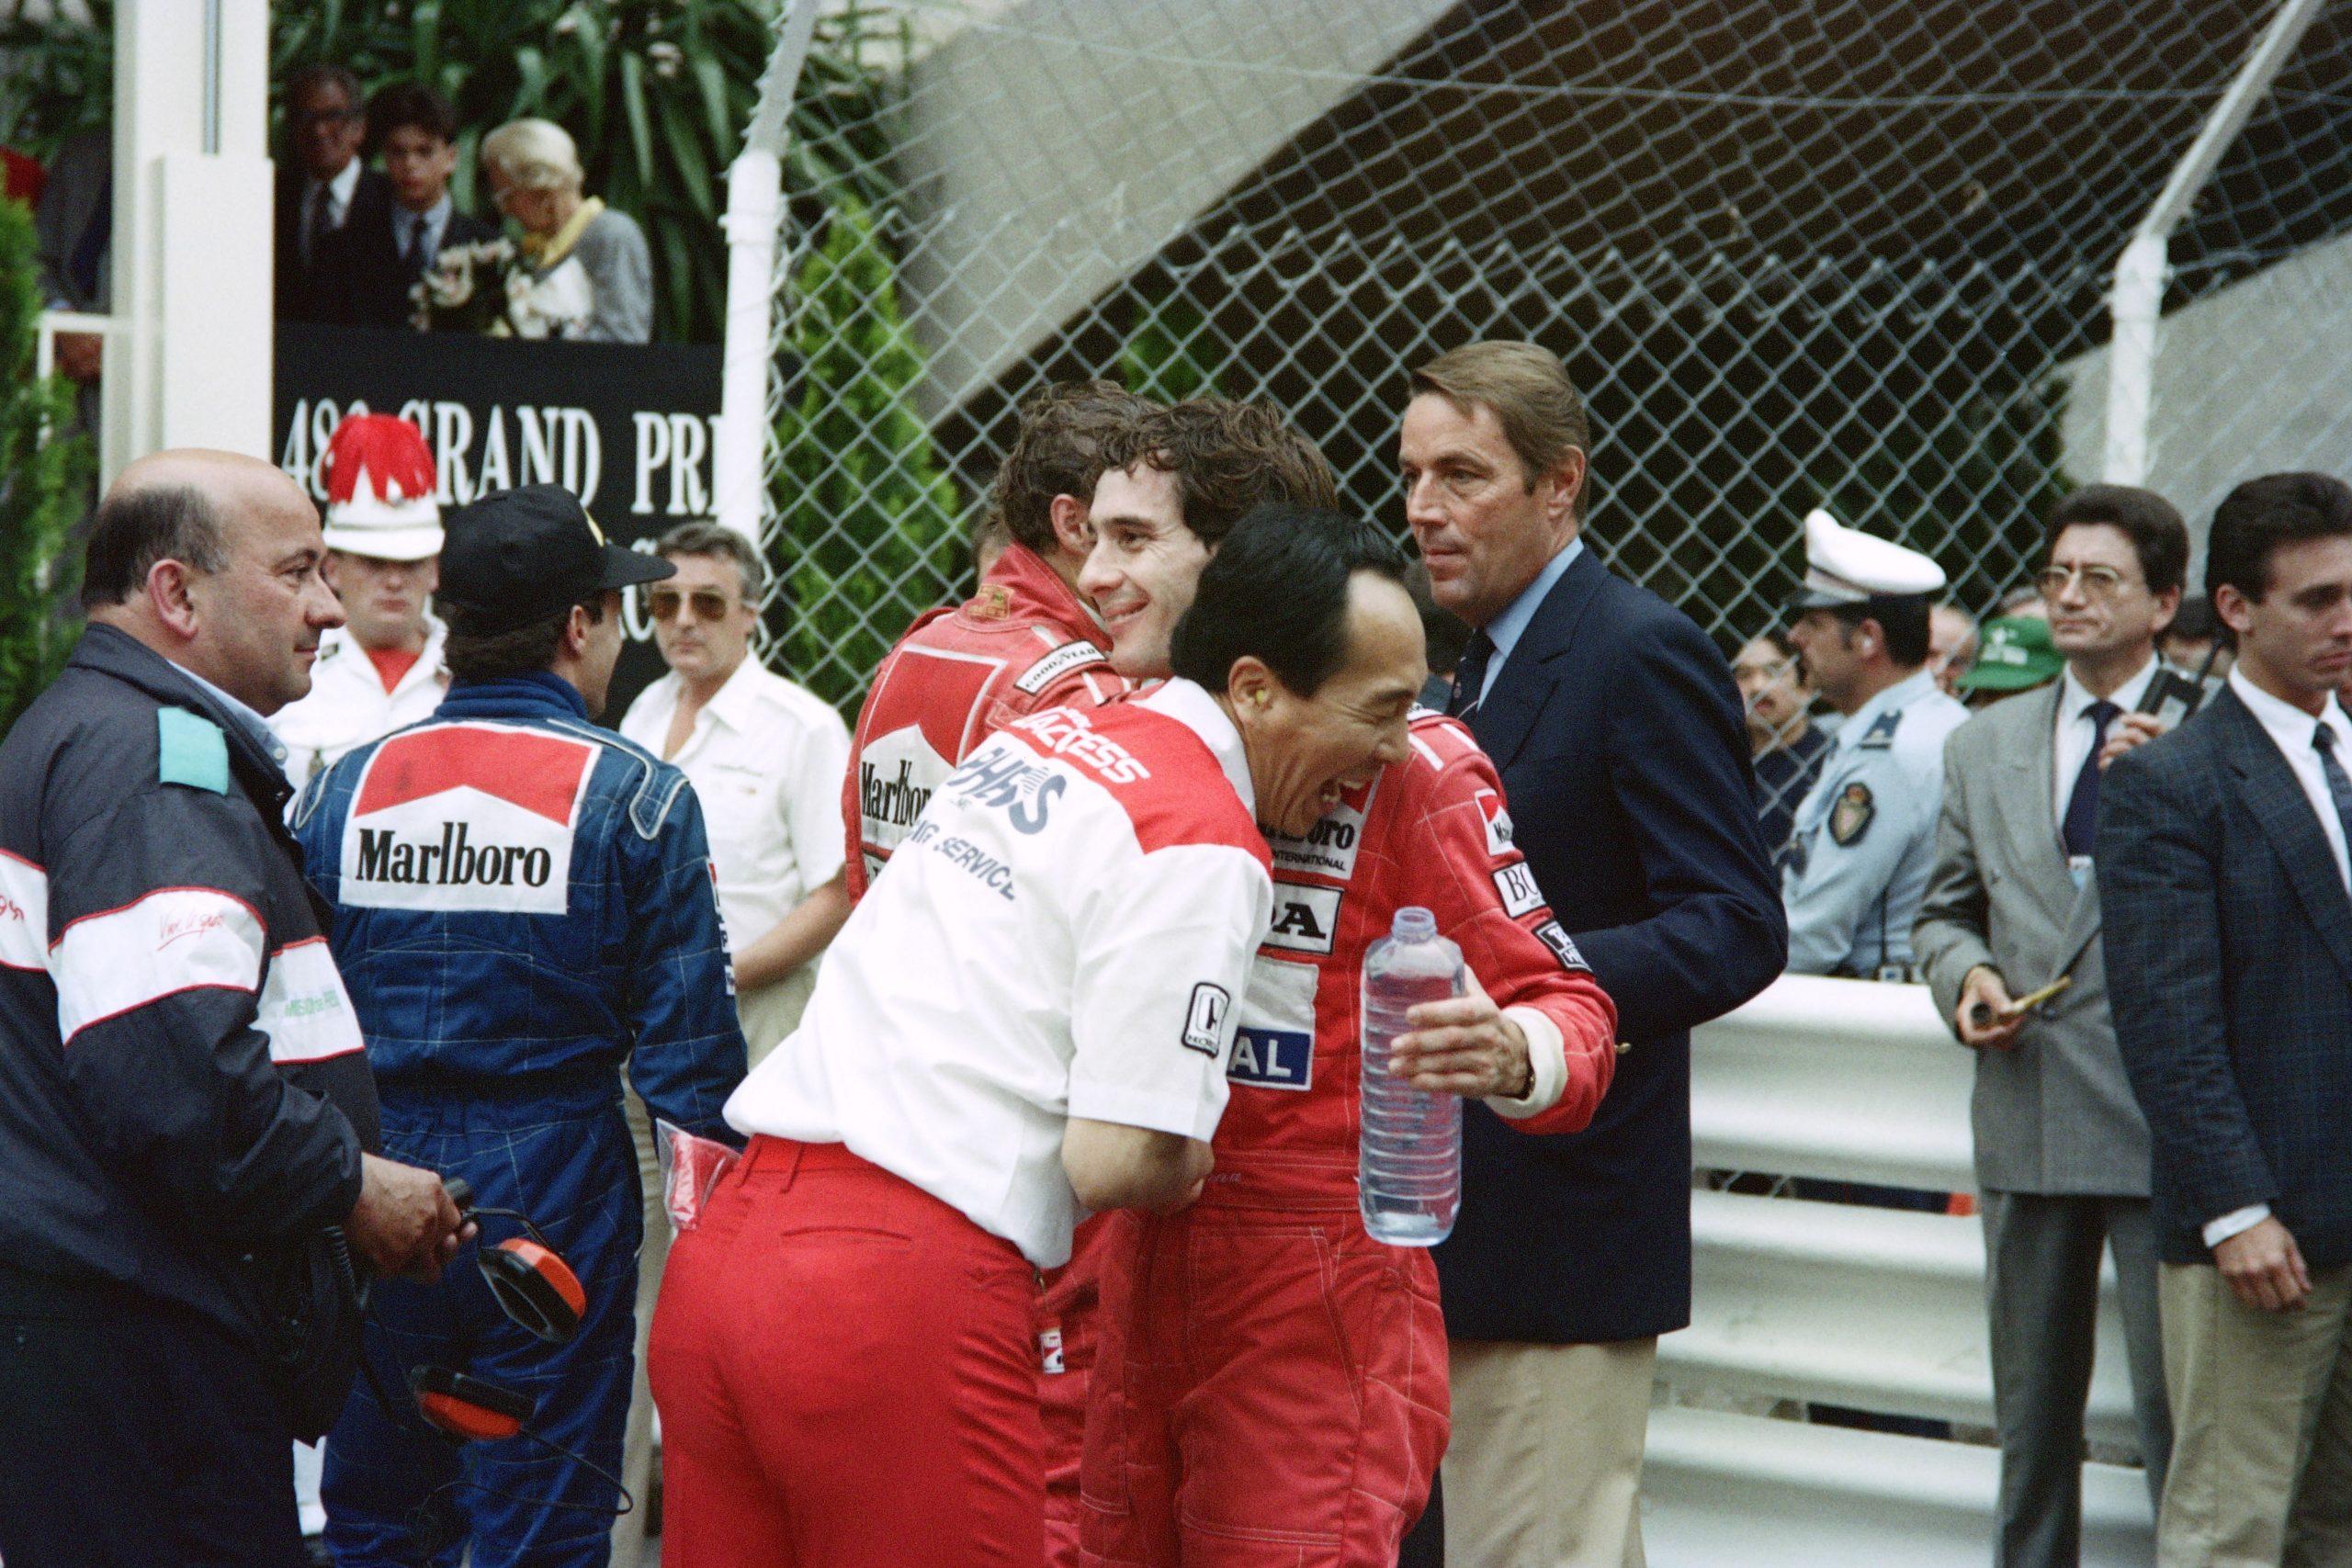 McLaren team member embraces Brazilian driver Ayrton Senna